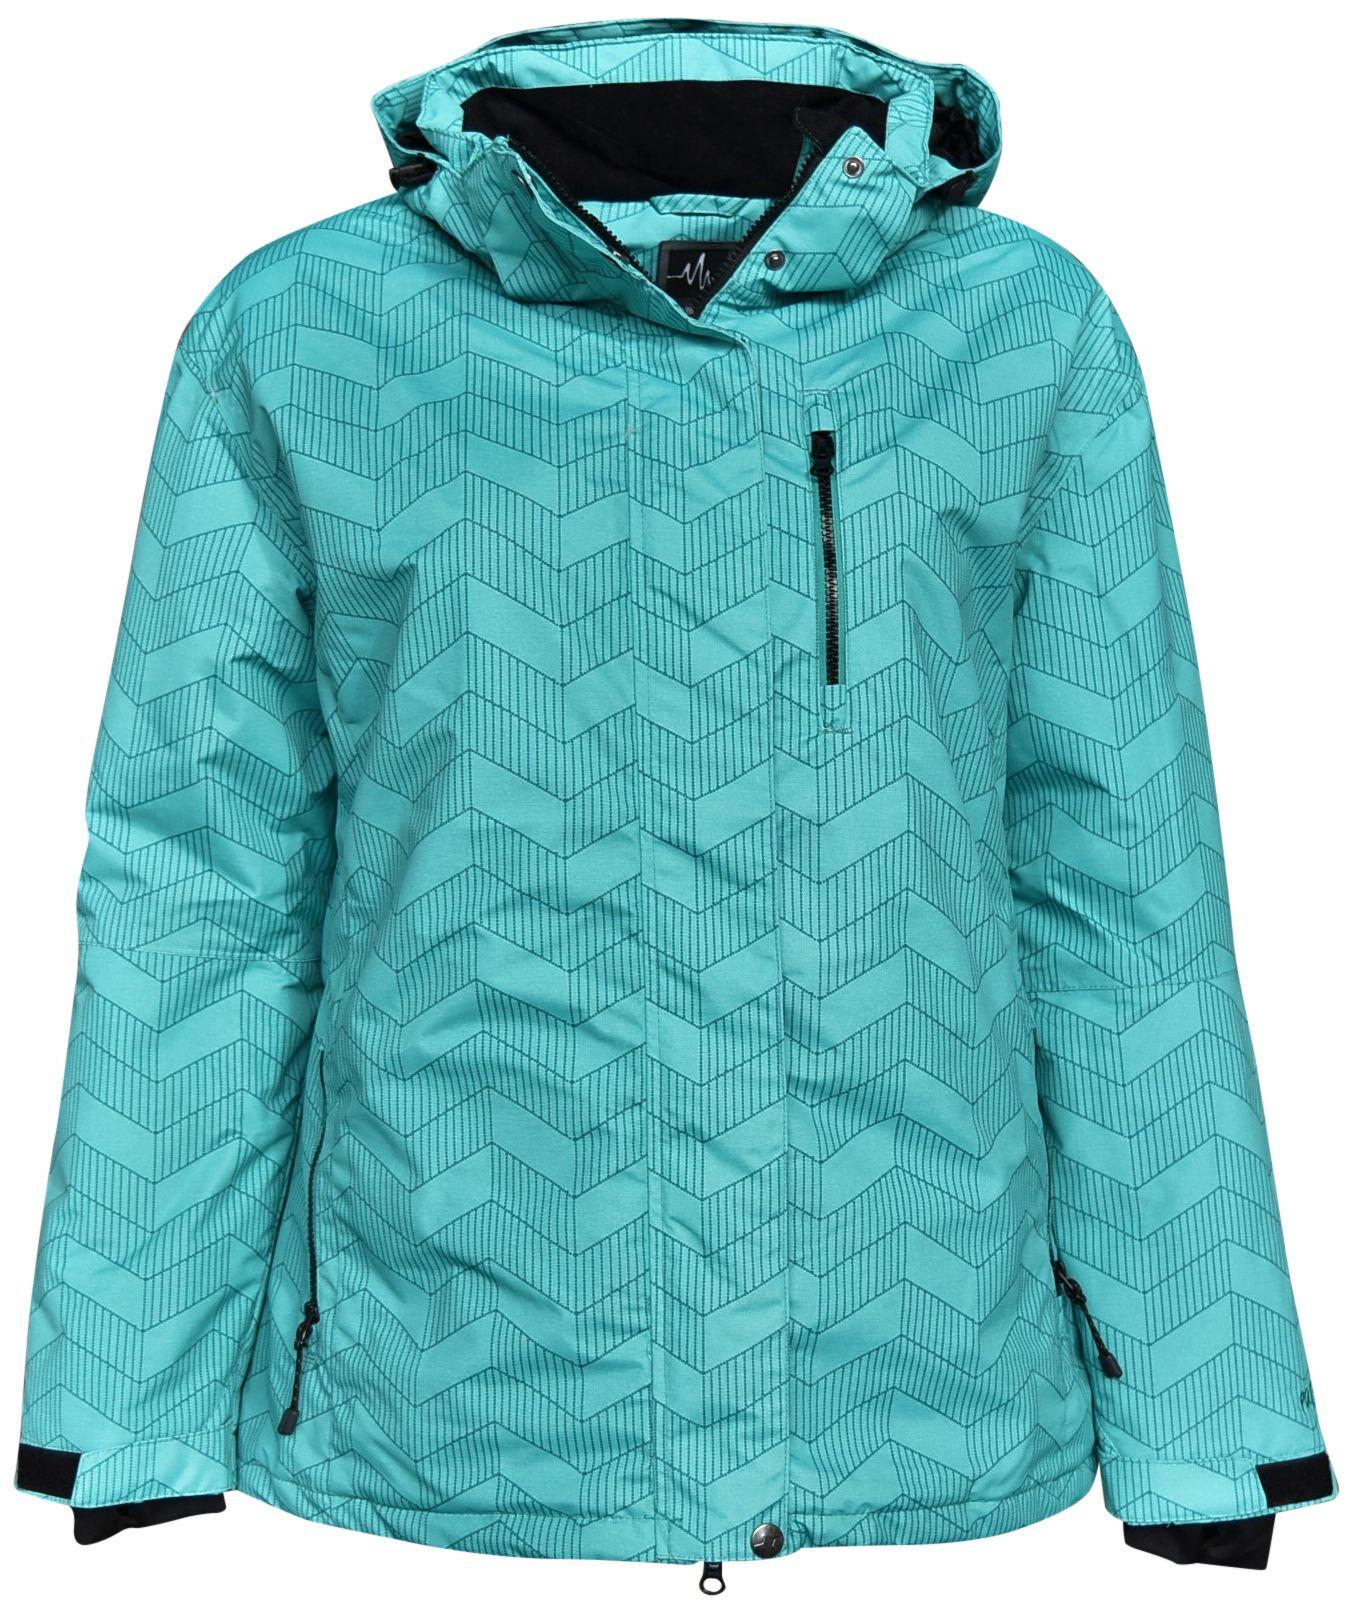 Pulse Women S Plus Size Insulated Ski Jacket 1x 2x 3x 4x 5x 6x Bevel Teal Ski Jacket Ski Jacket Women Fashion Clothes Women [ 1613 x 1354 Pixel ]